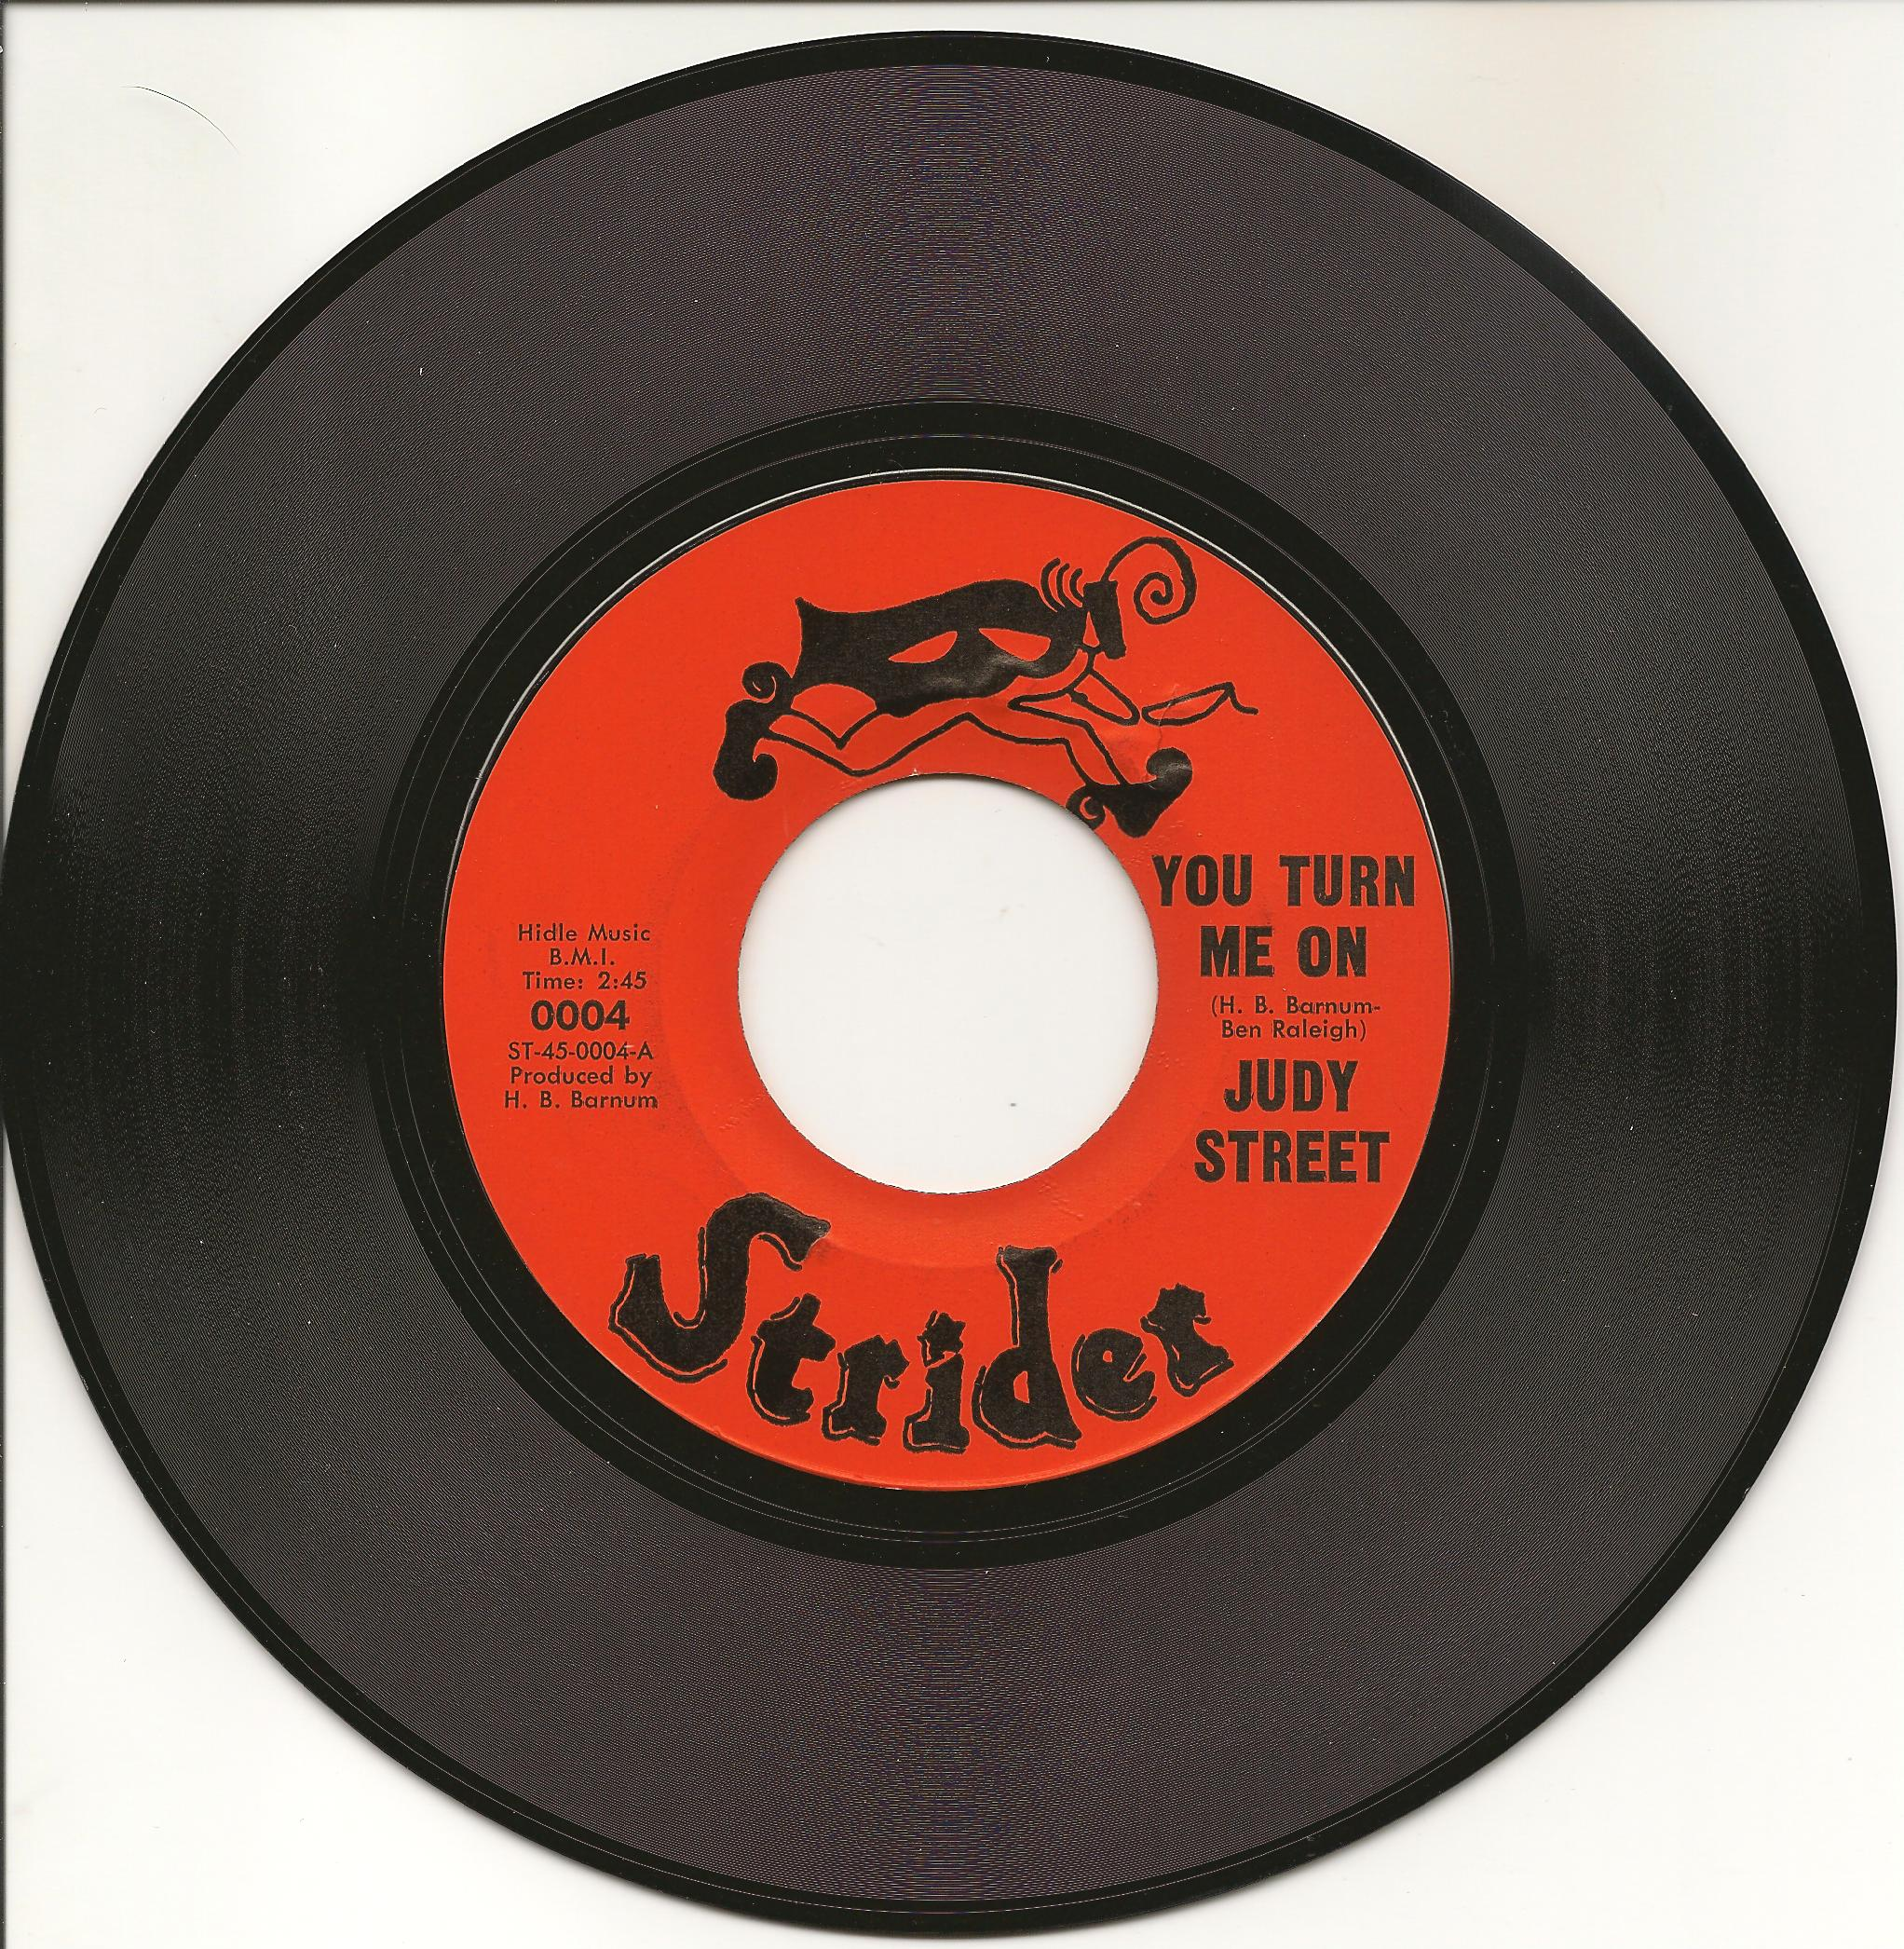 You -Turn-Me-On-judy-street-record.jpg